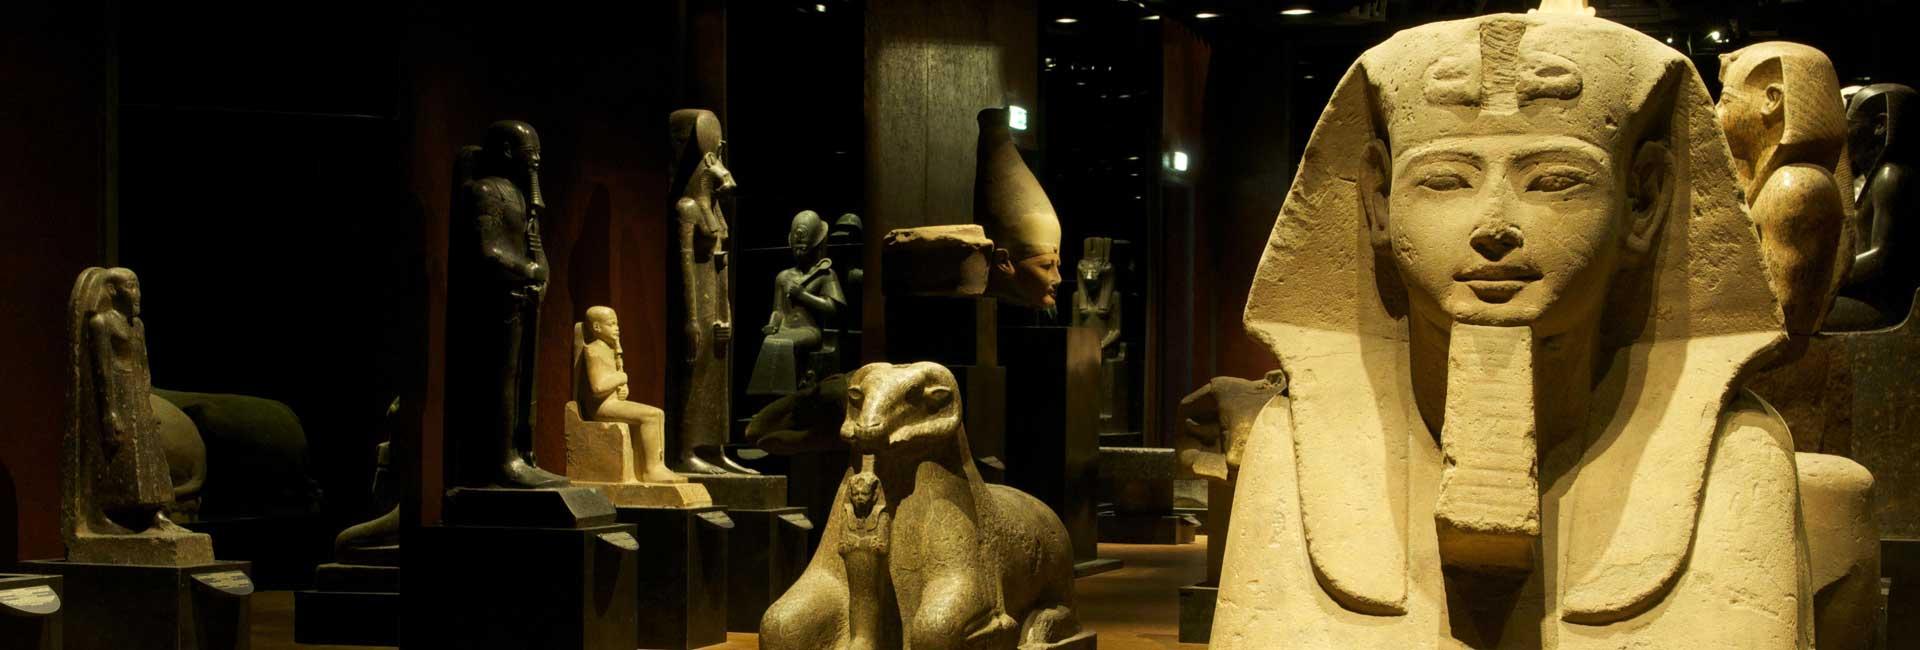 Cairo Museums